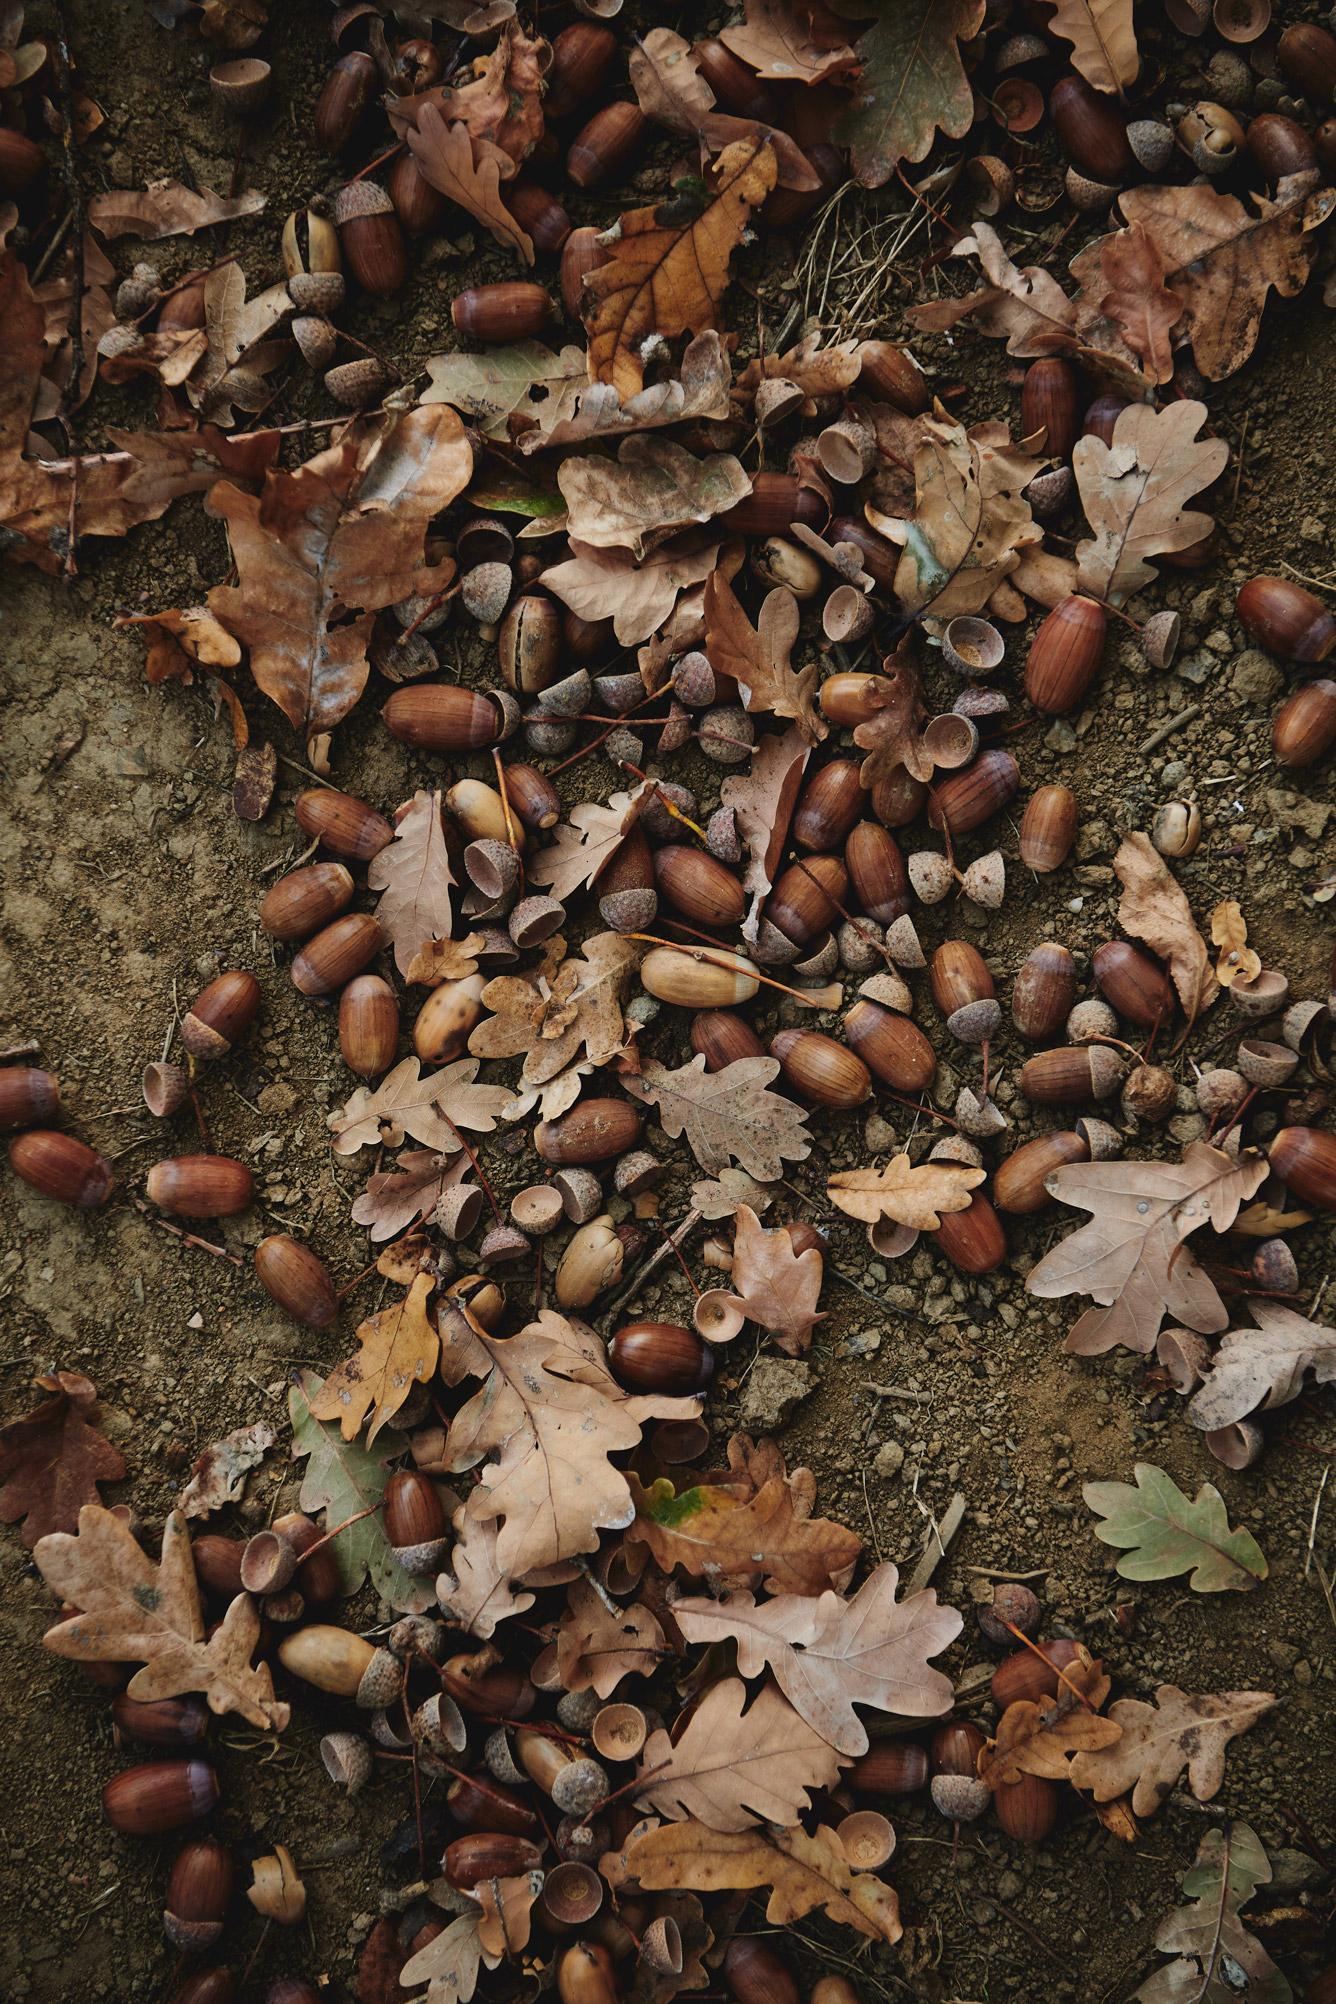 stk-wein-frauwallner-nature-soil-floor